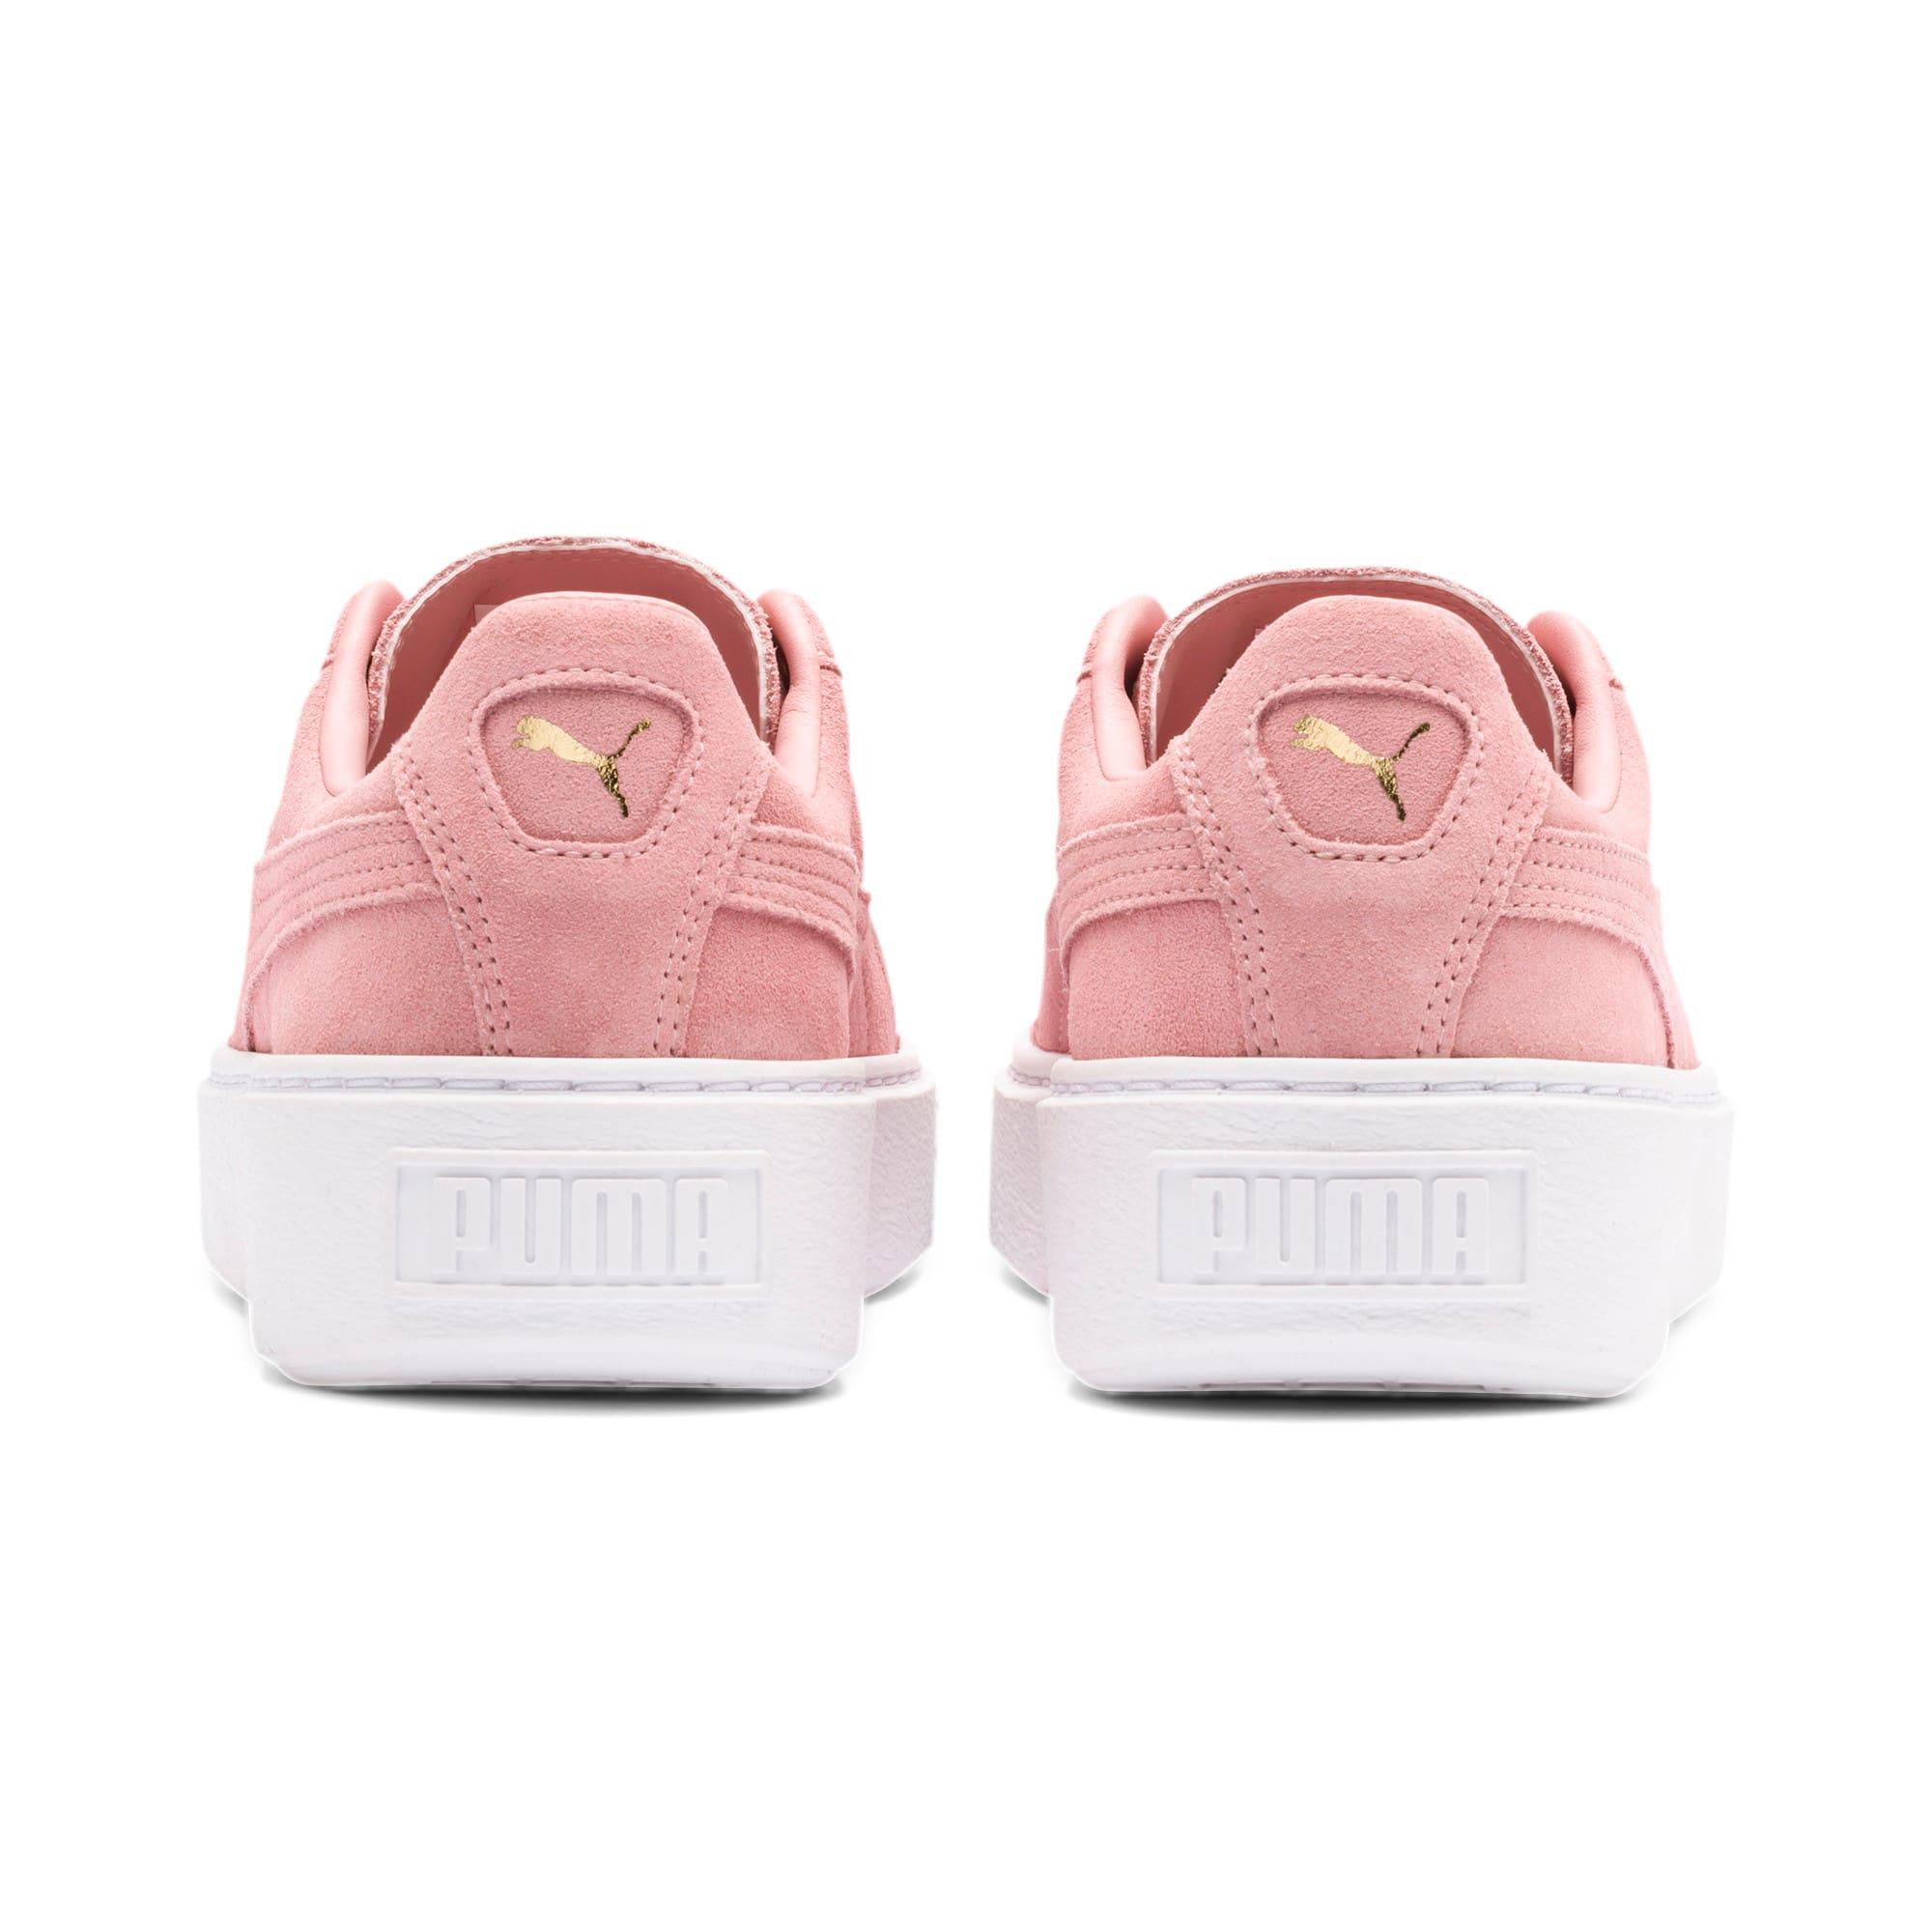 Thumbnail 5 of Suede Platform Women's Sneakers, Bridal Rose-Puma Team Gold, medium